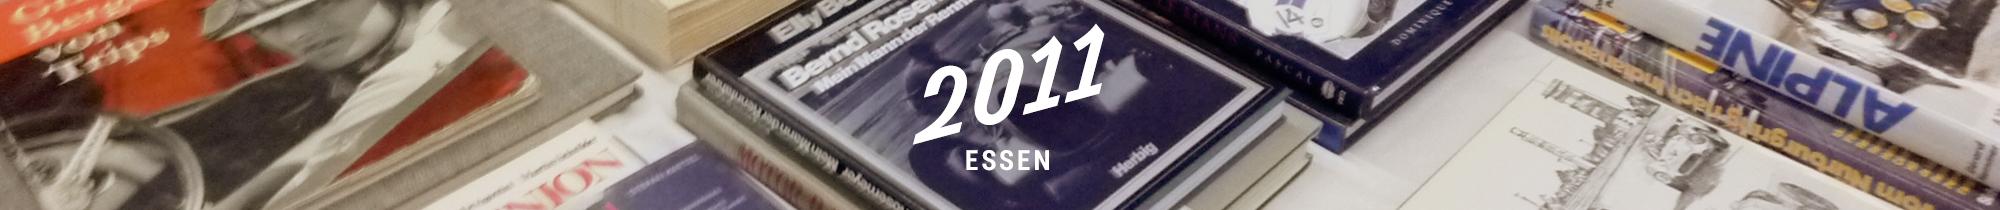 2011-essen-slidi-01